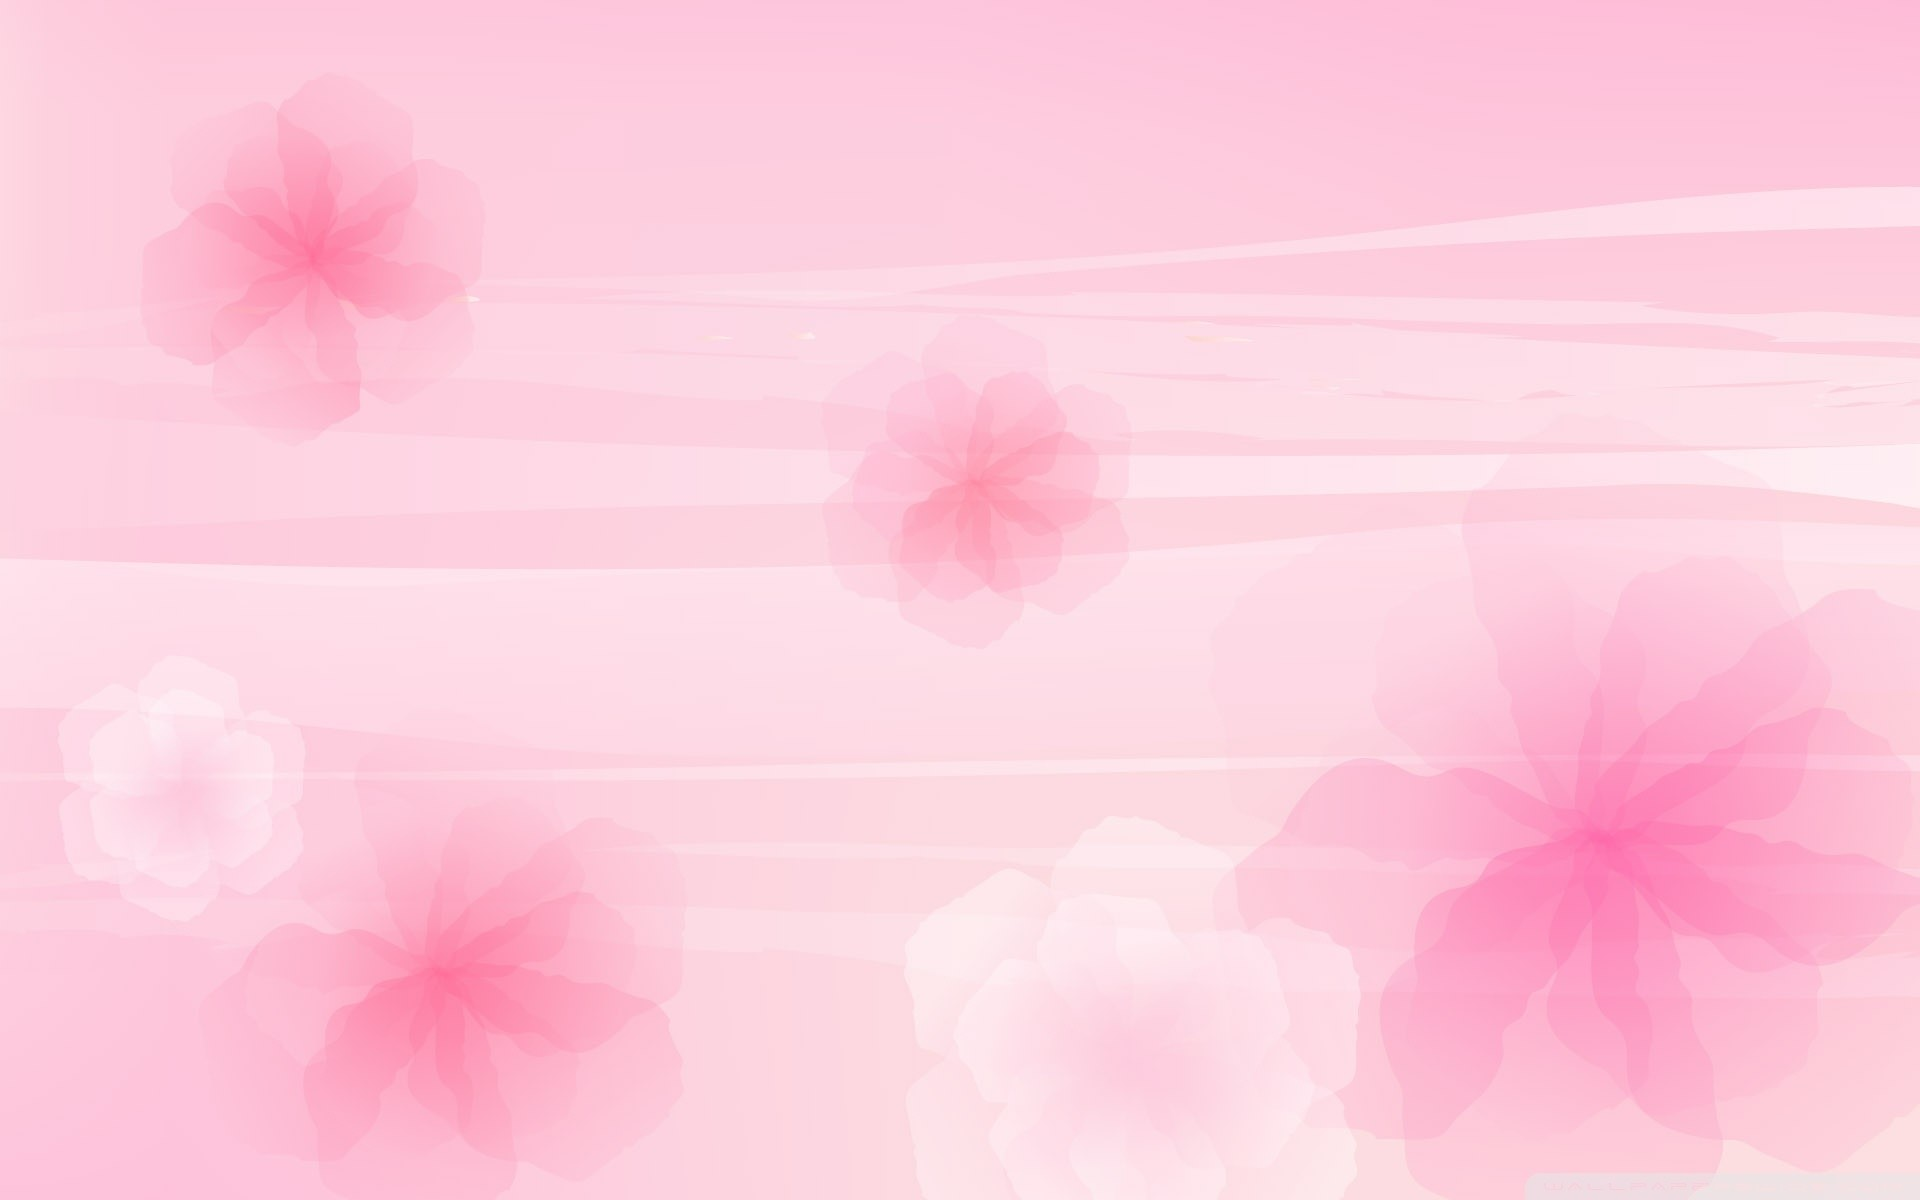 Pink Background Designs WallPaper HD – https://imashon.com/w/